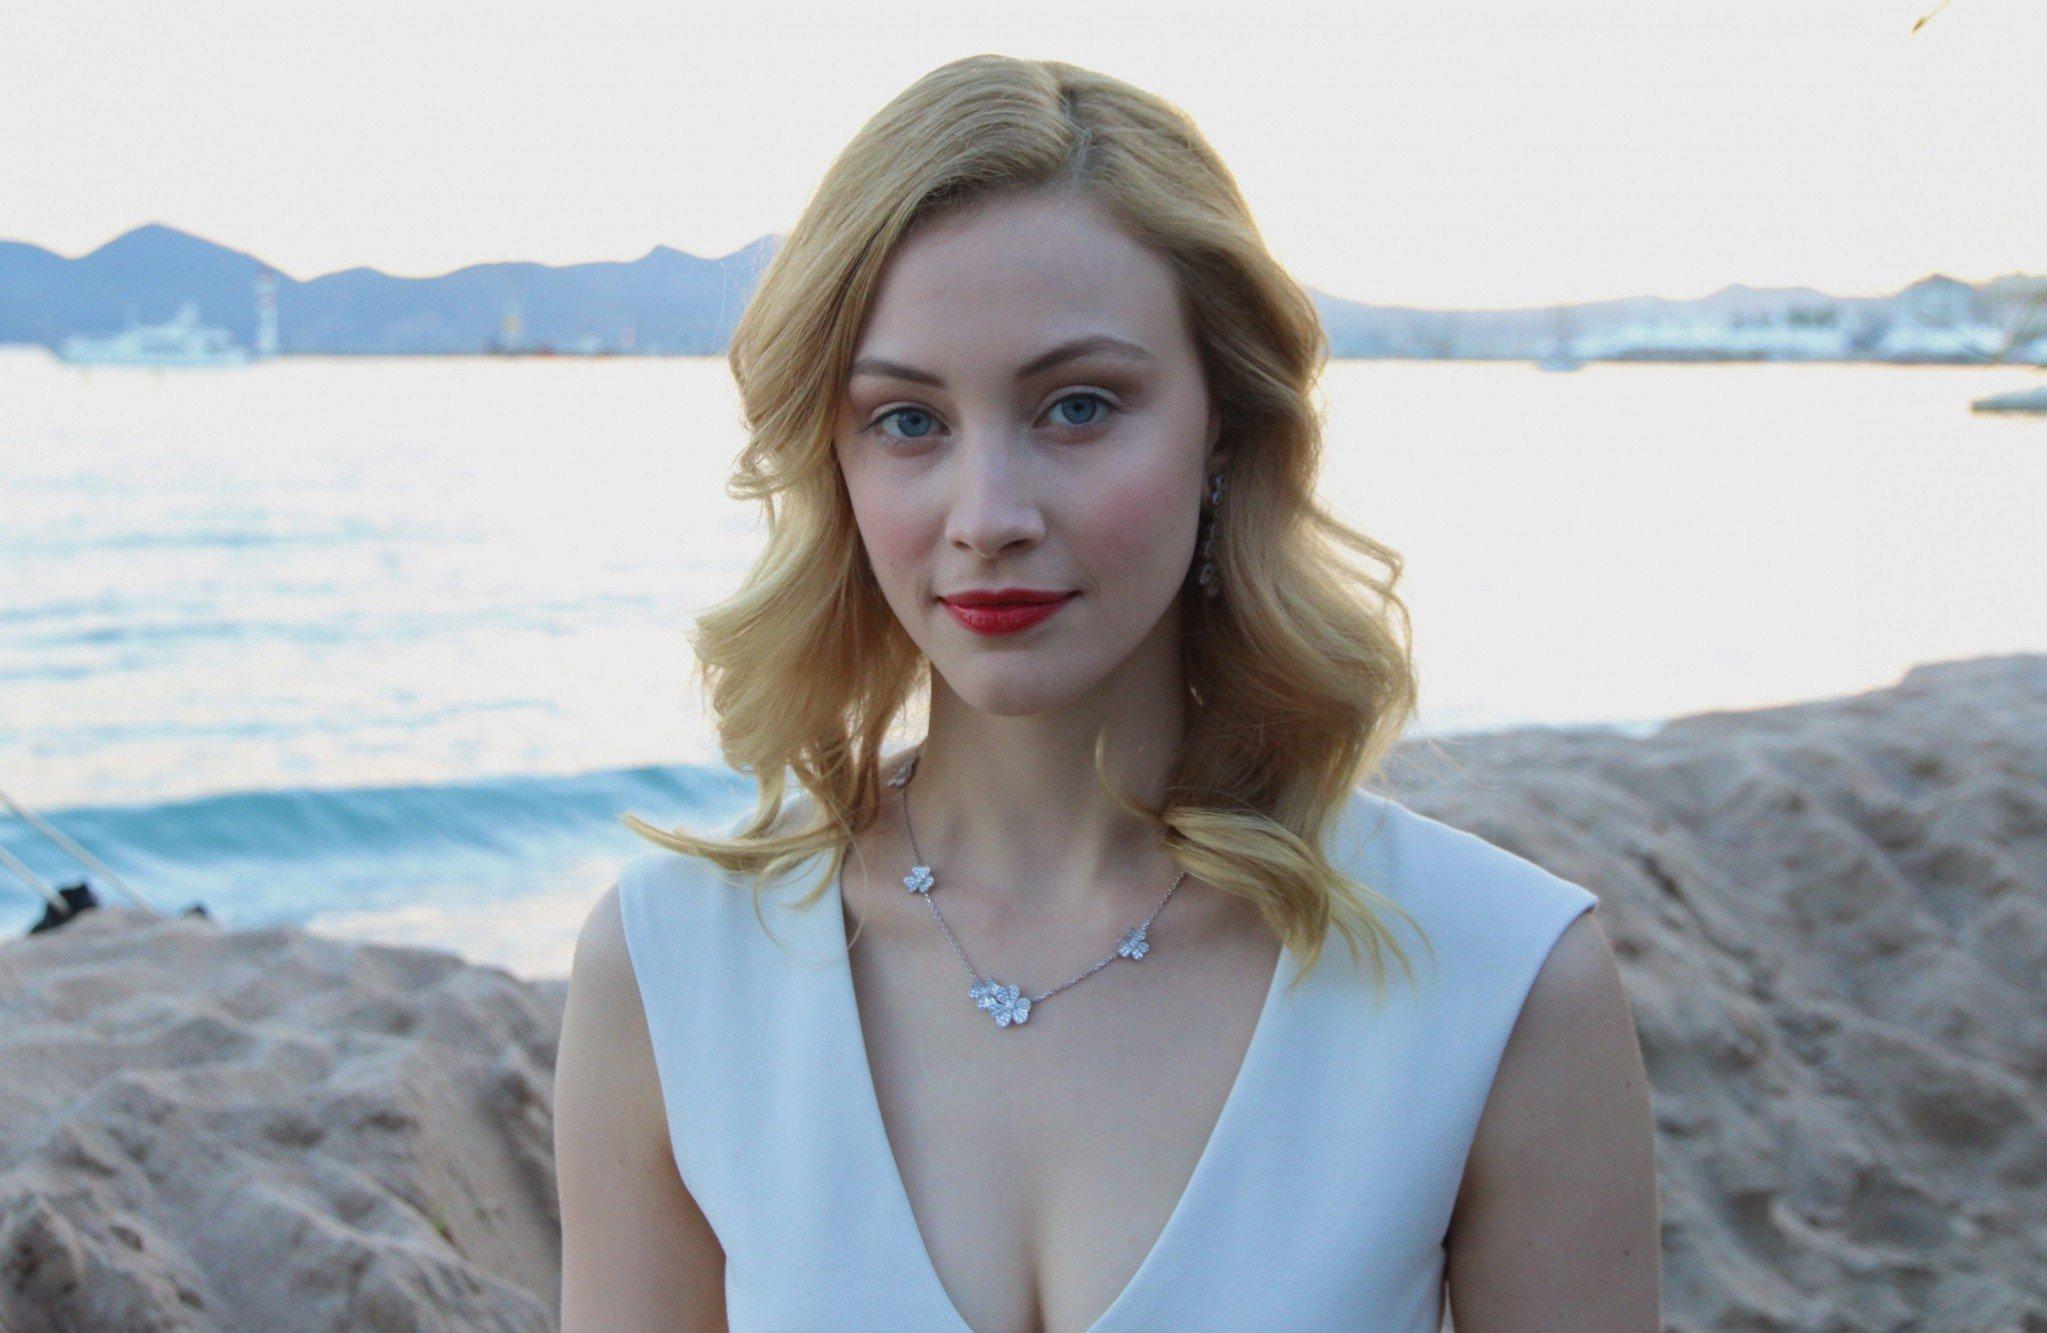 Sarah Gadon, Women, Actress, Blonde, Red lipstick, Blue eyes Wallpaper